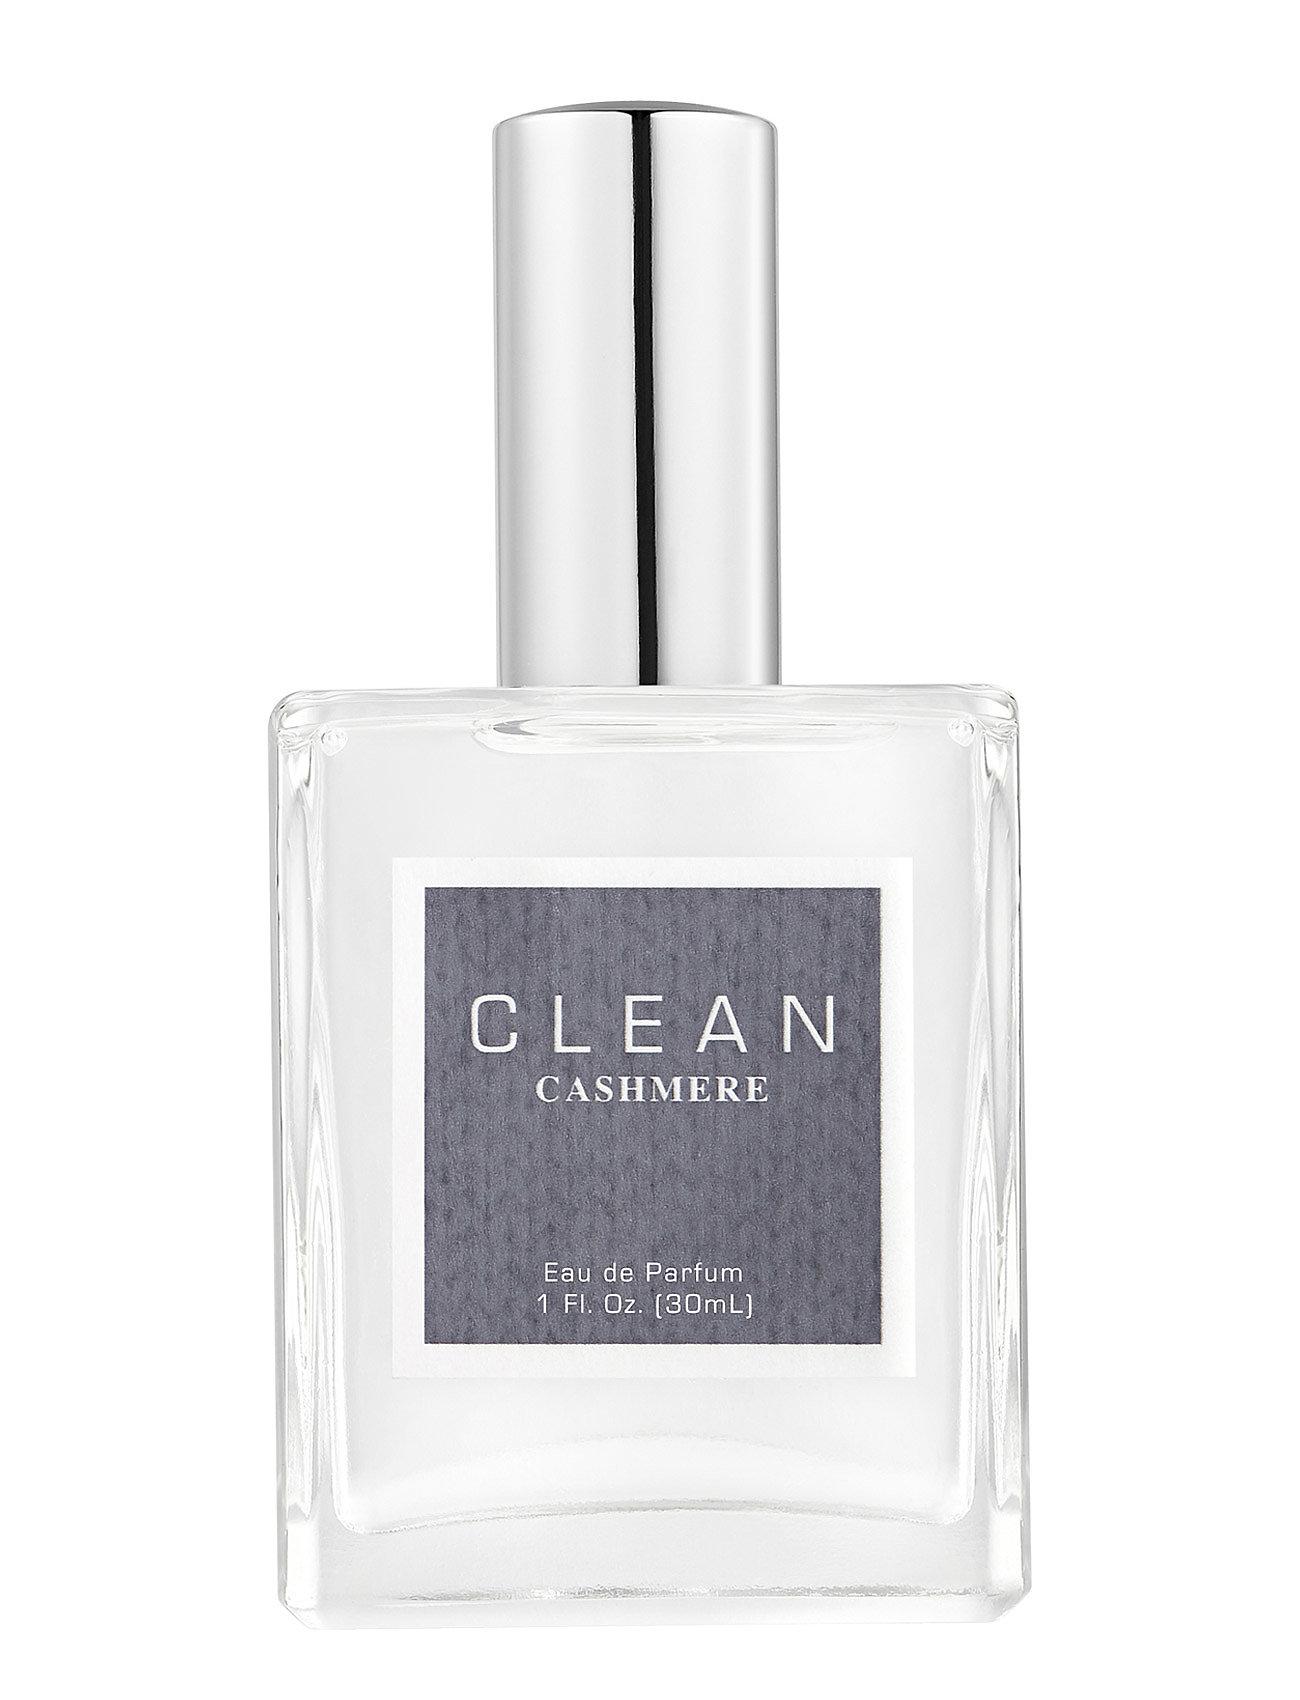 clean – Cashmere fra boozt.com dk